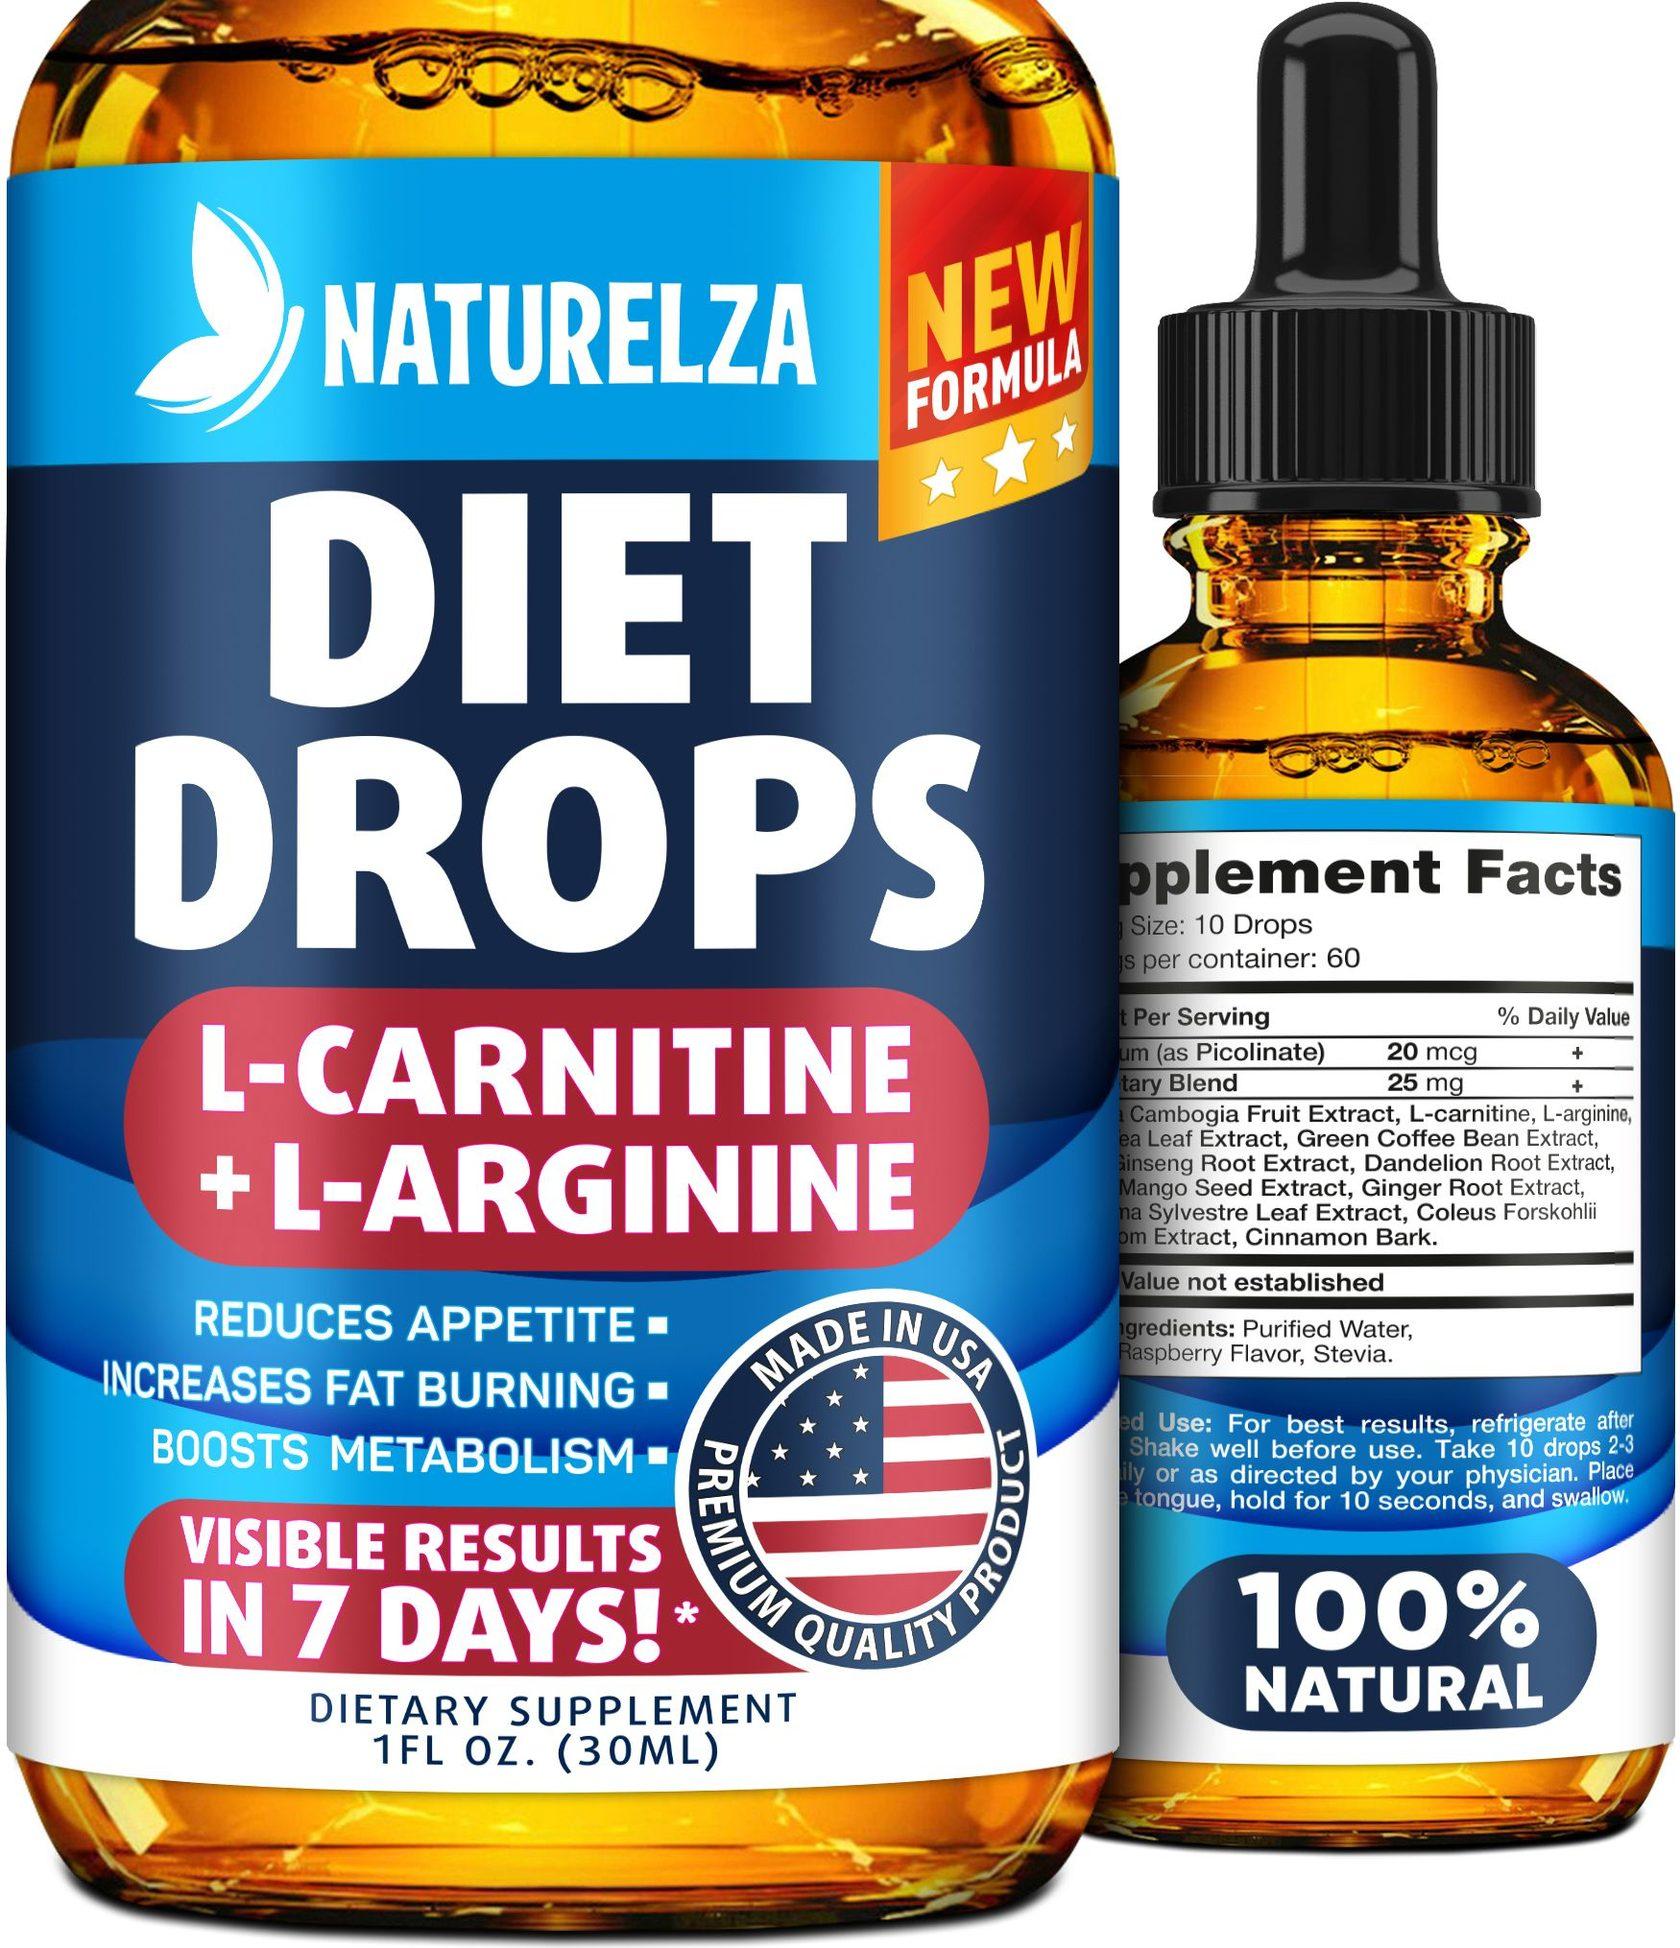 free bottle of diet drops naturelza